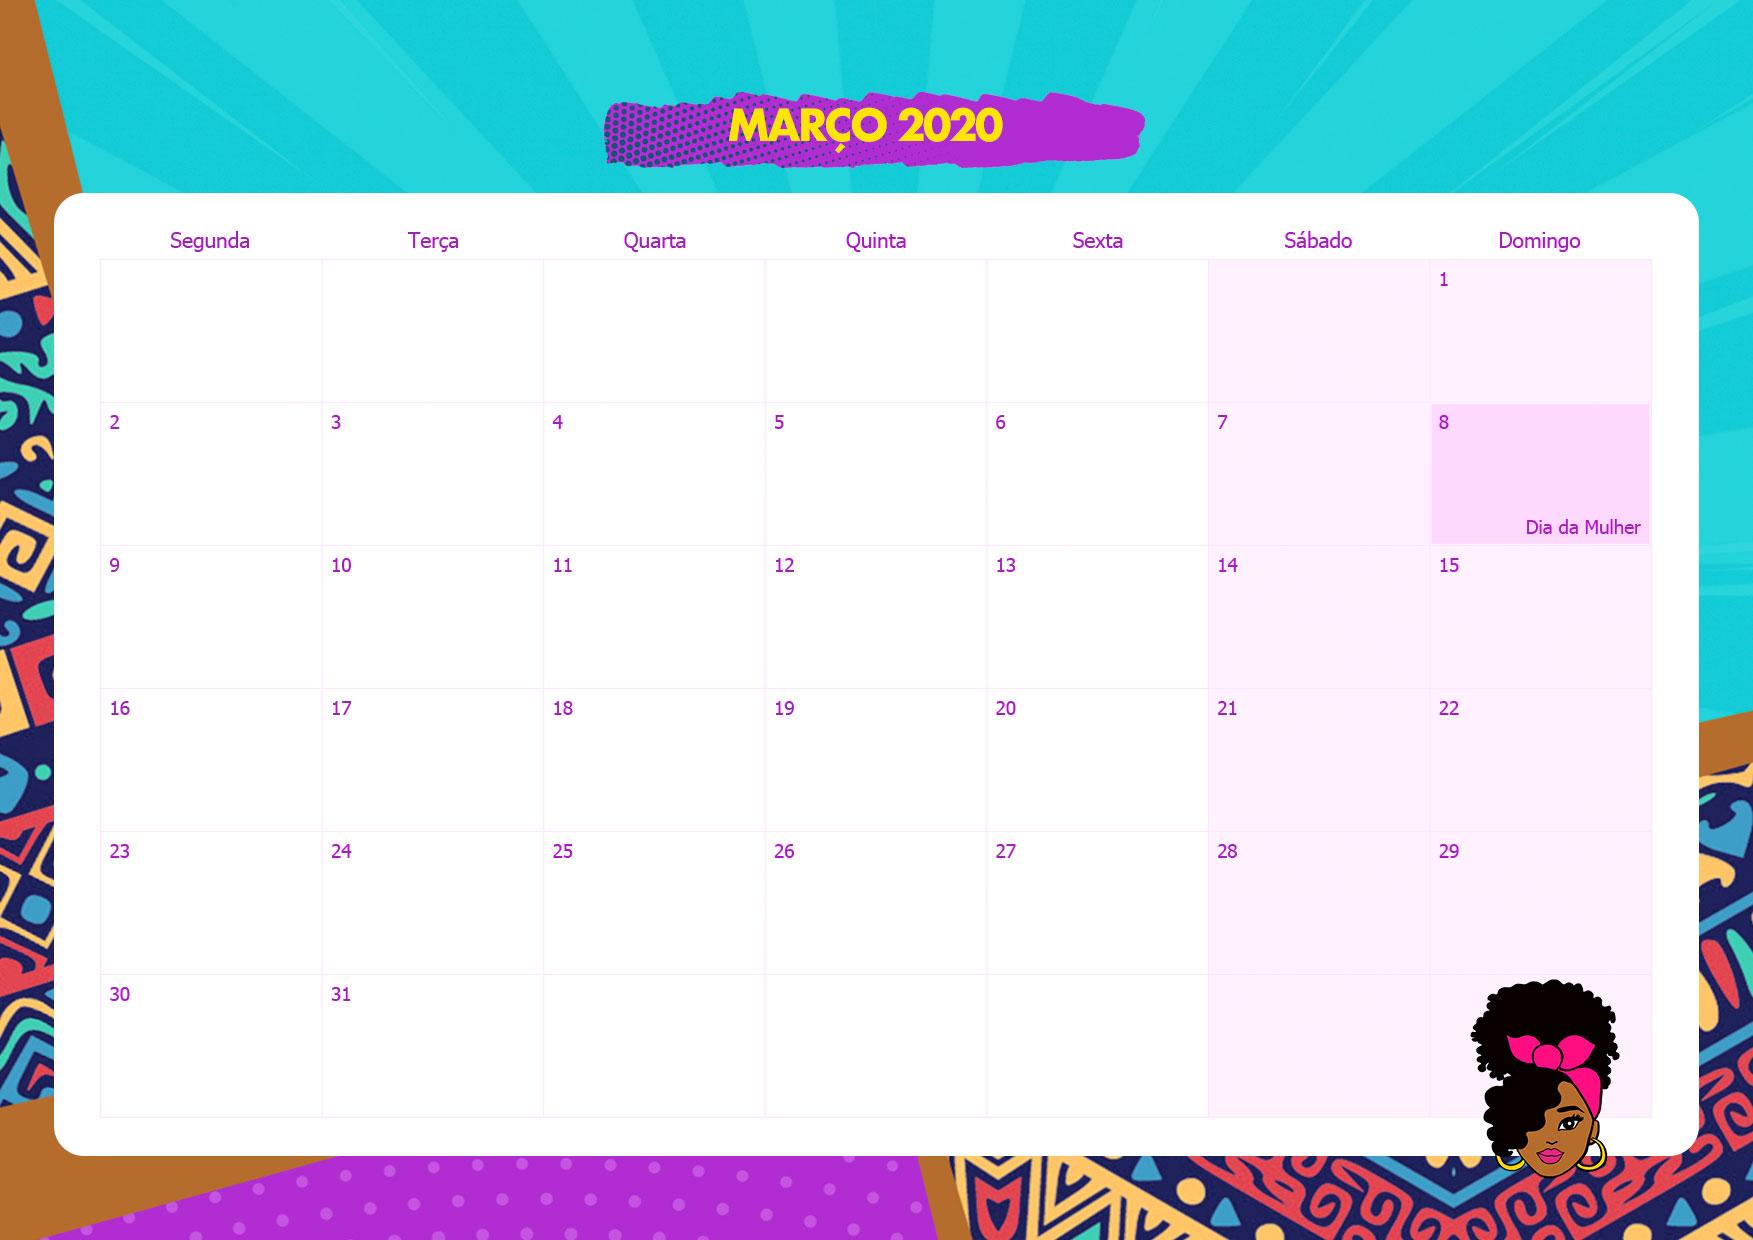 Calendario Mensal Mulher Afro Marco 2020